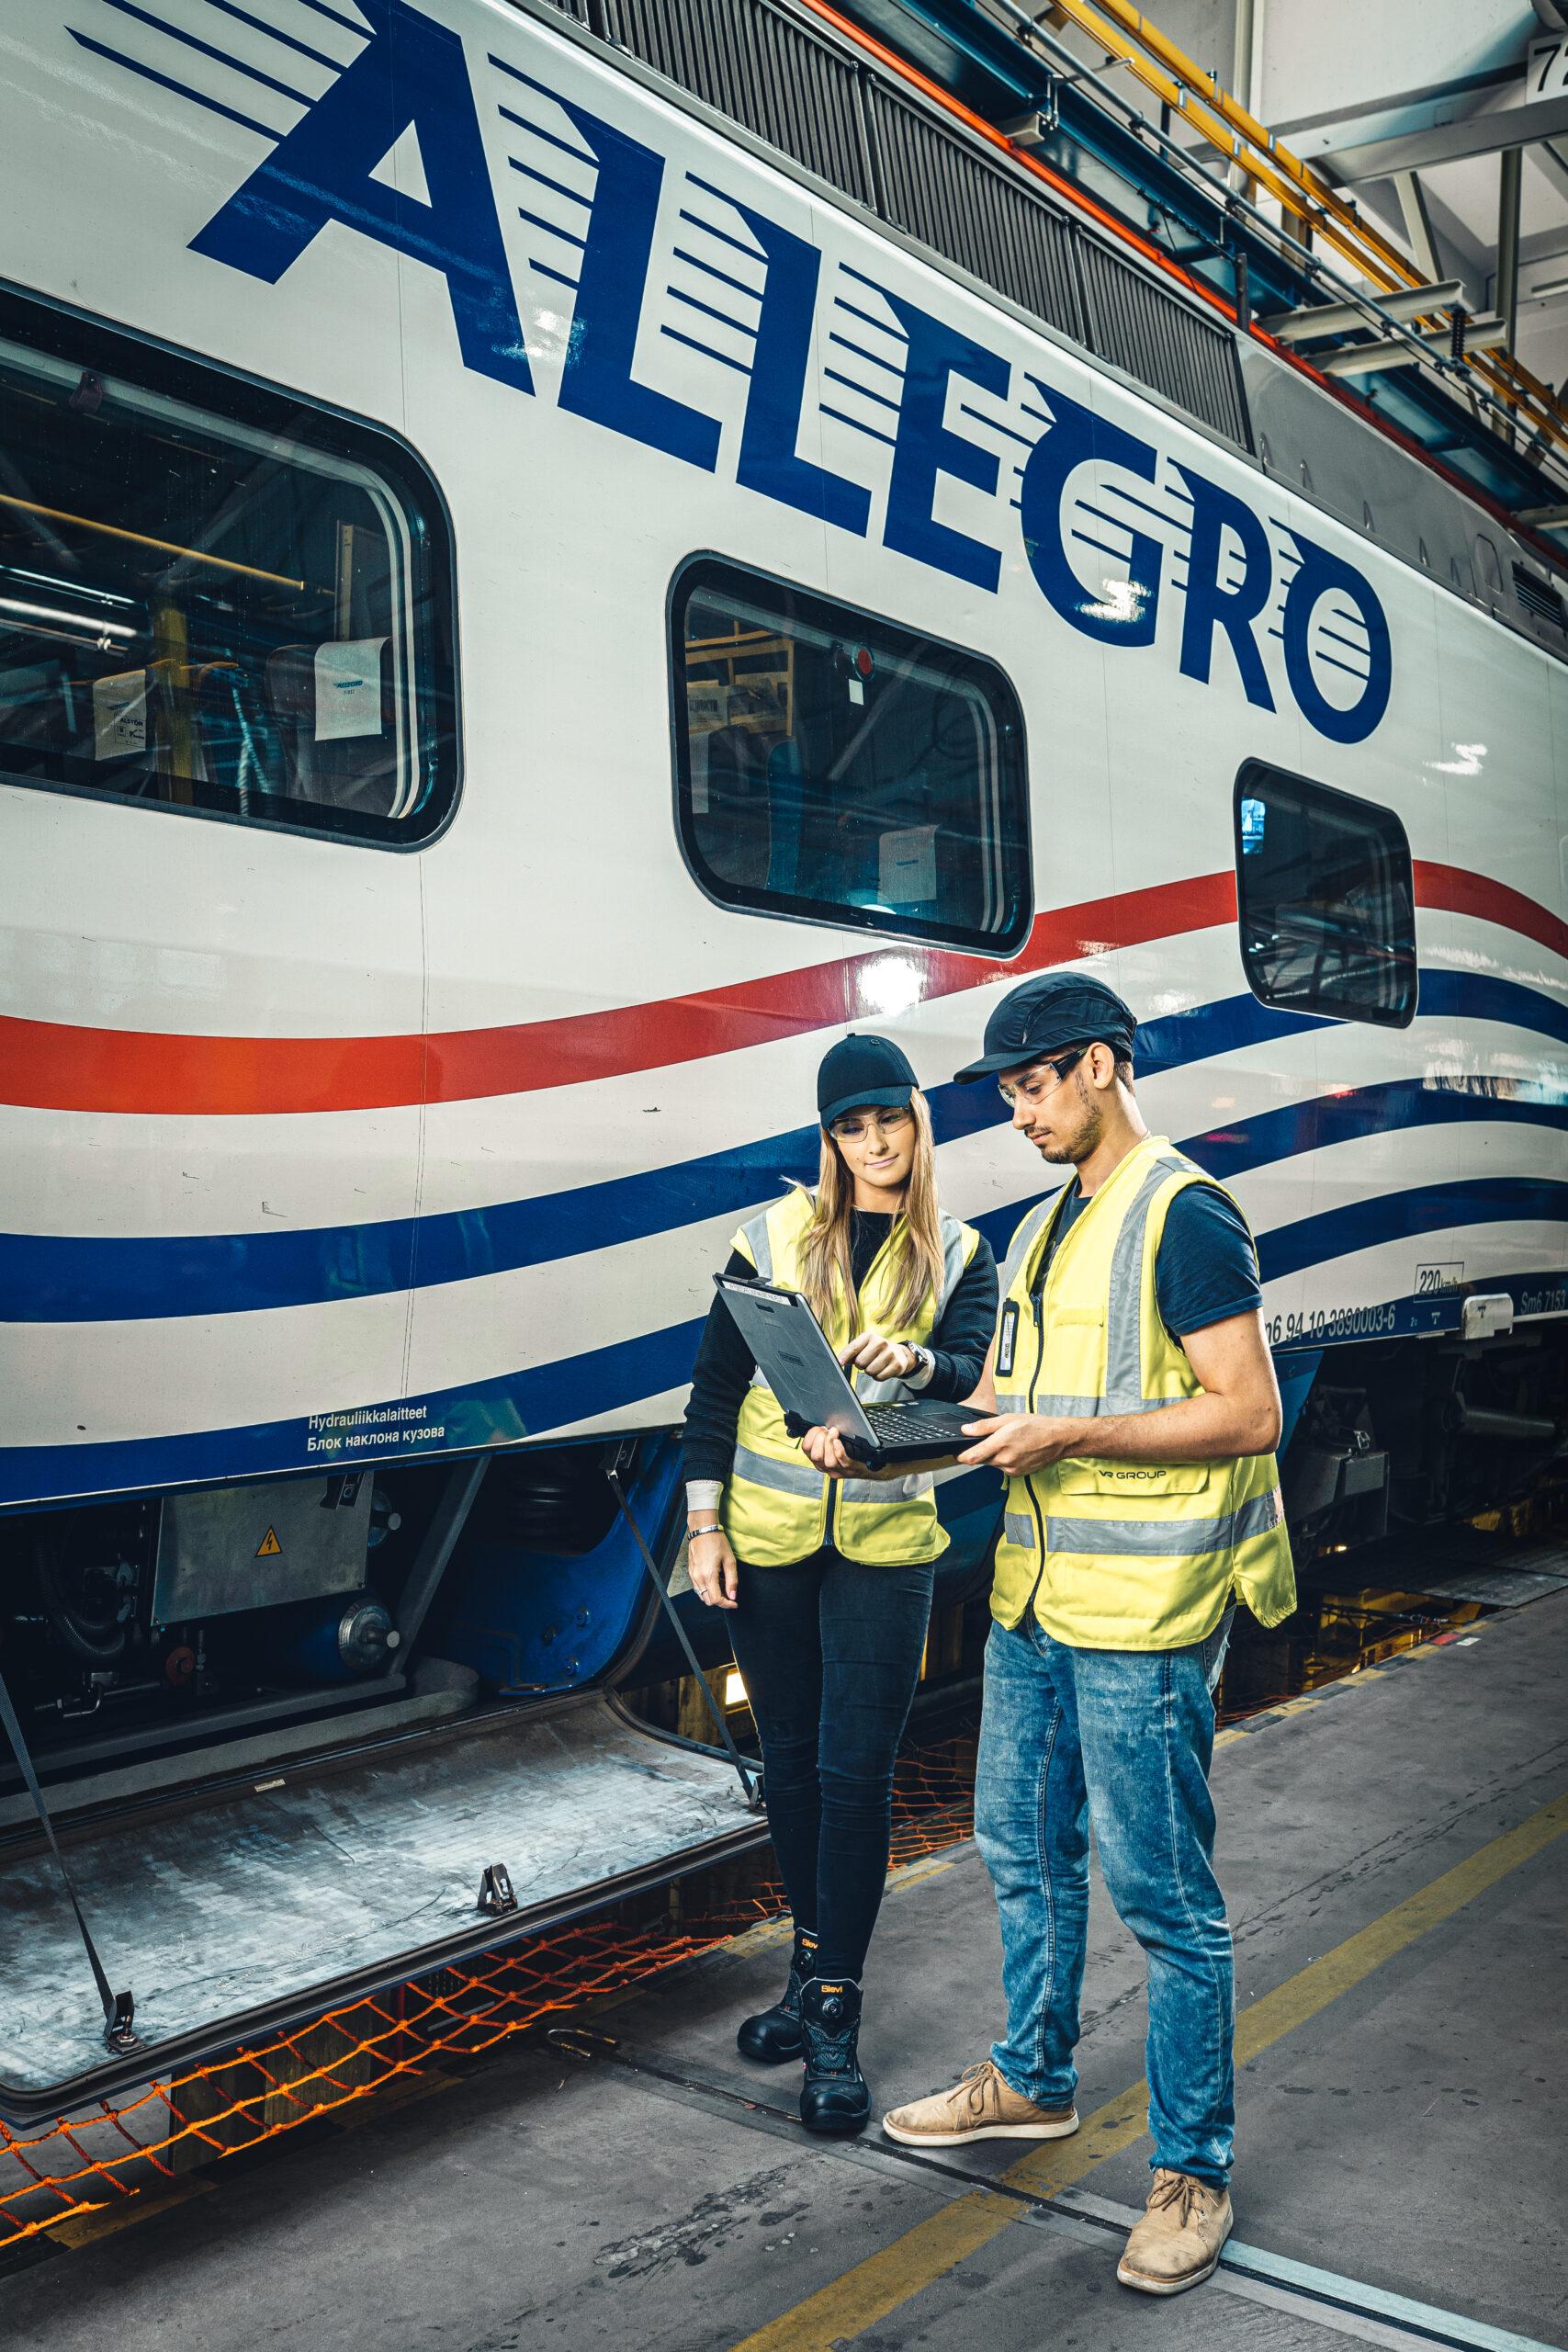 Experts reviewing maintenance diagnostics